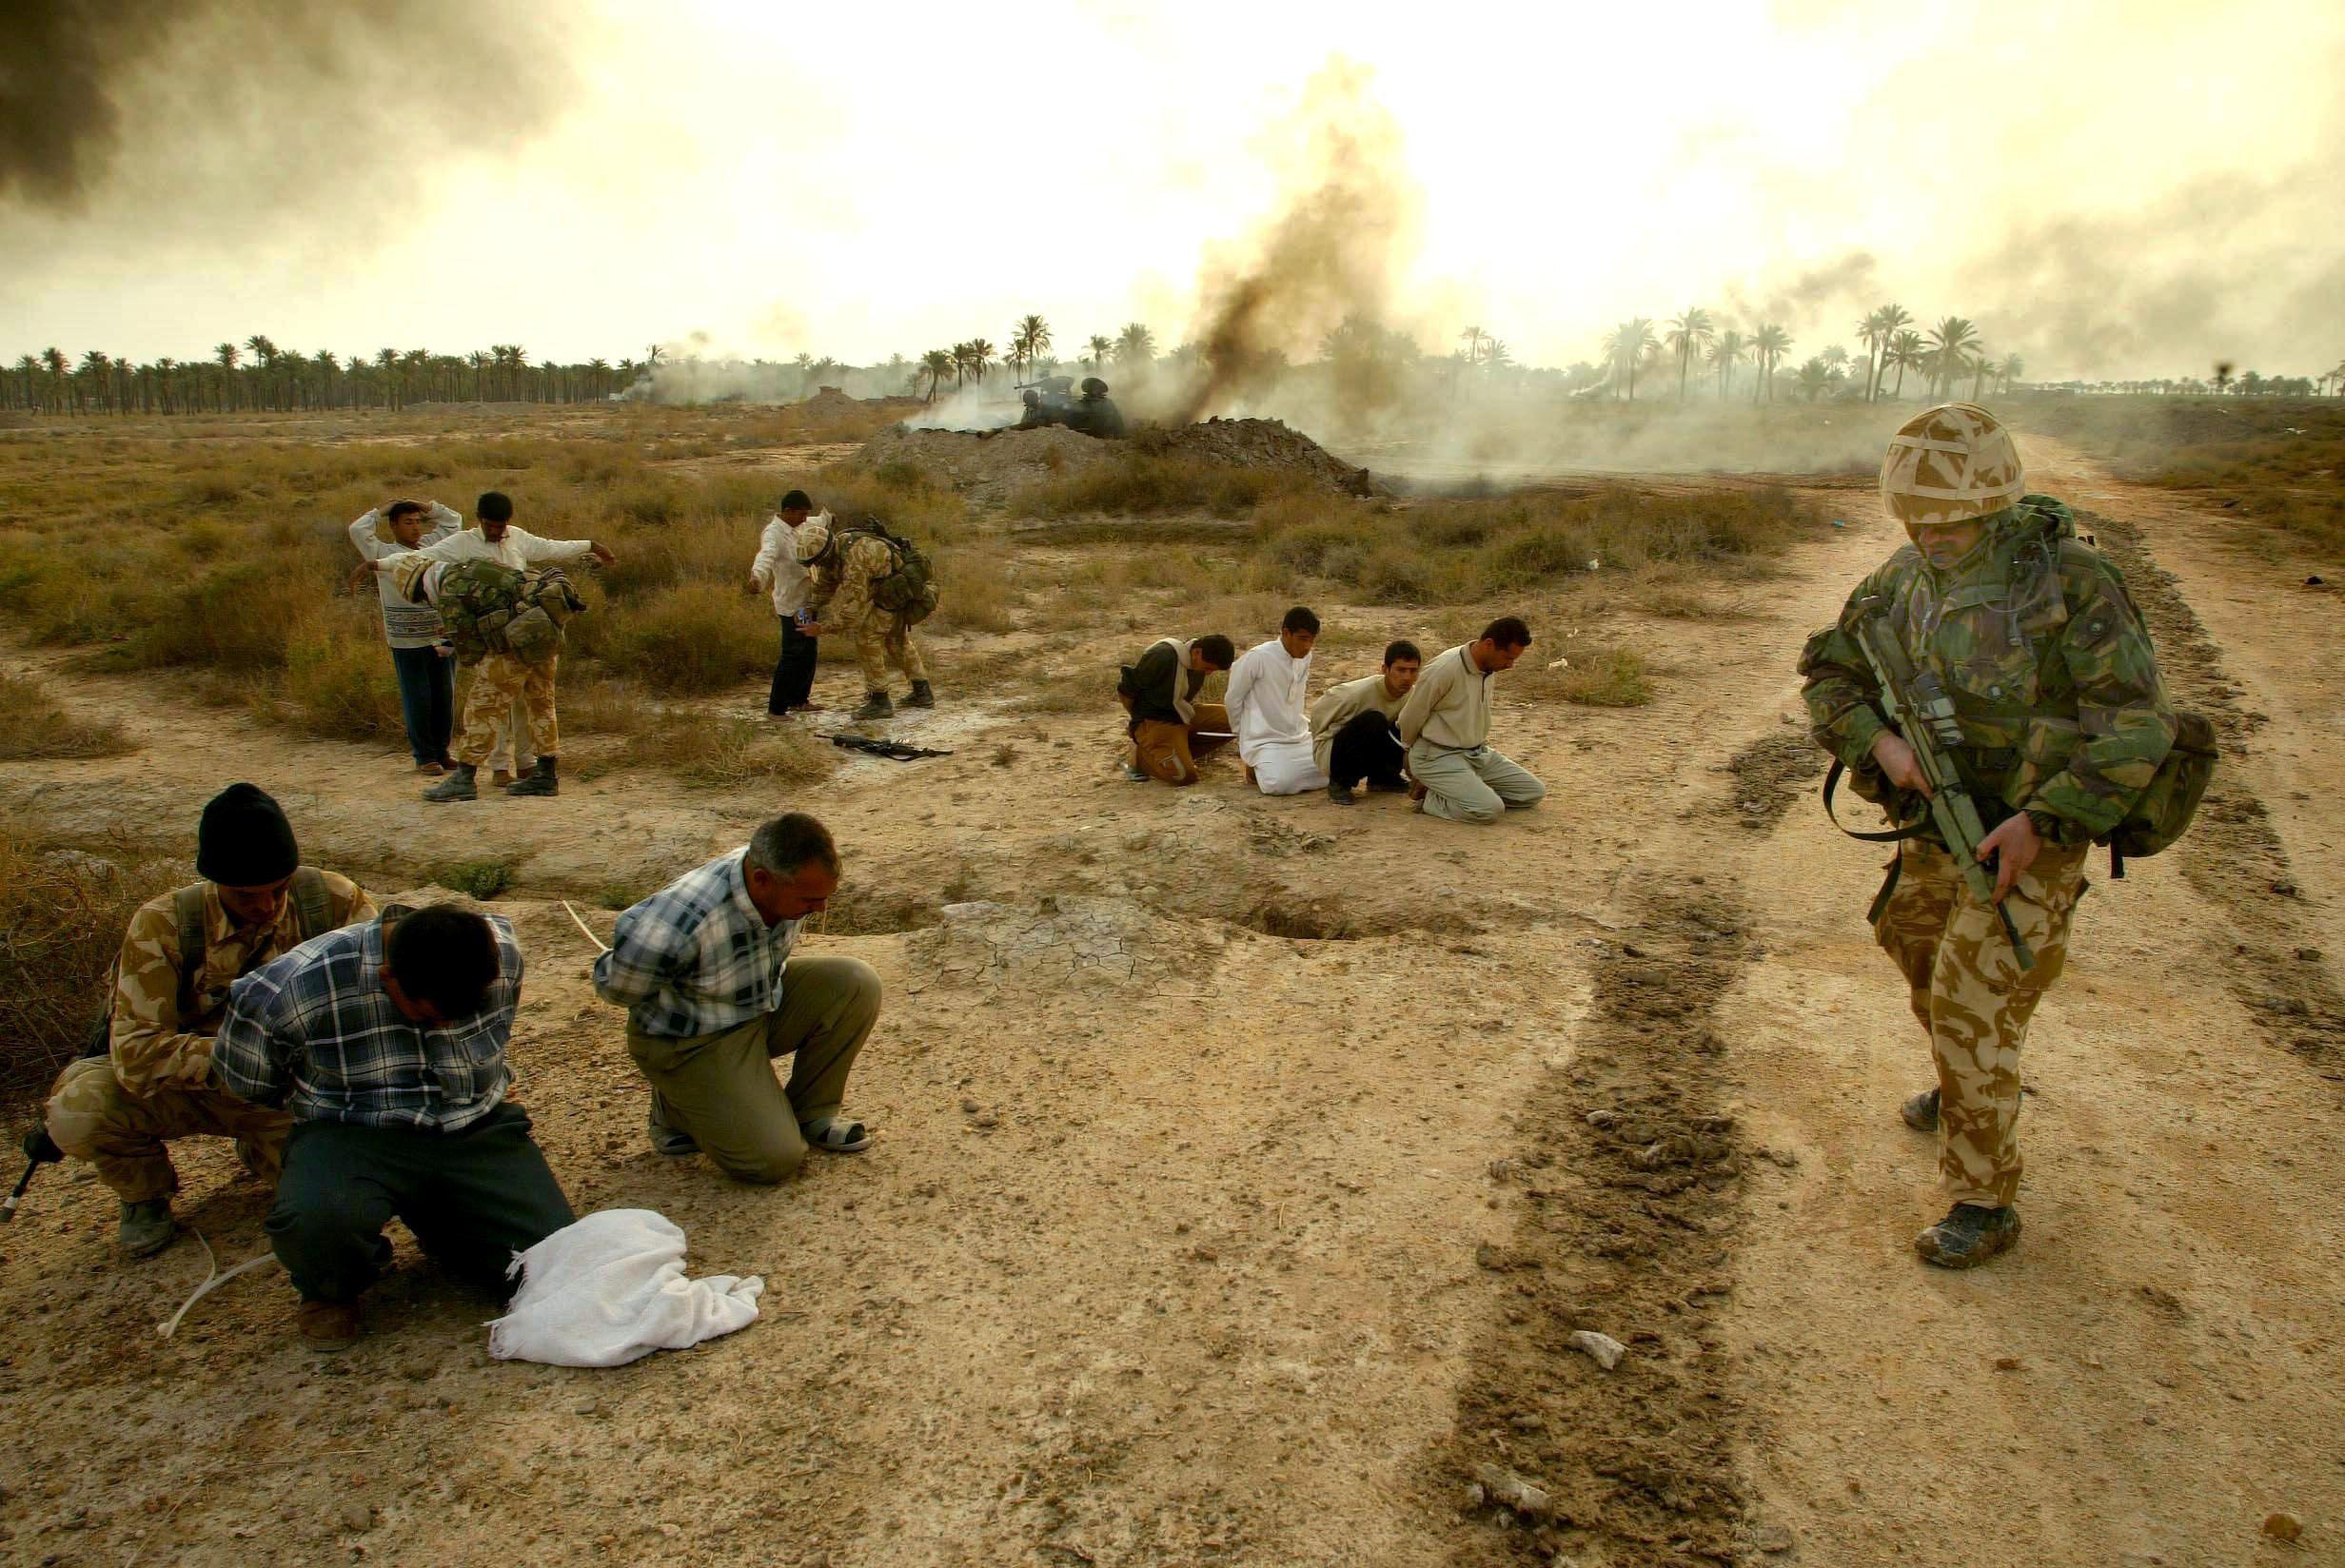 Iraqi militia surrender to Royal Marines